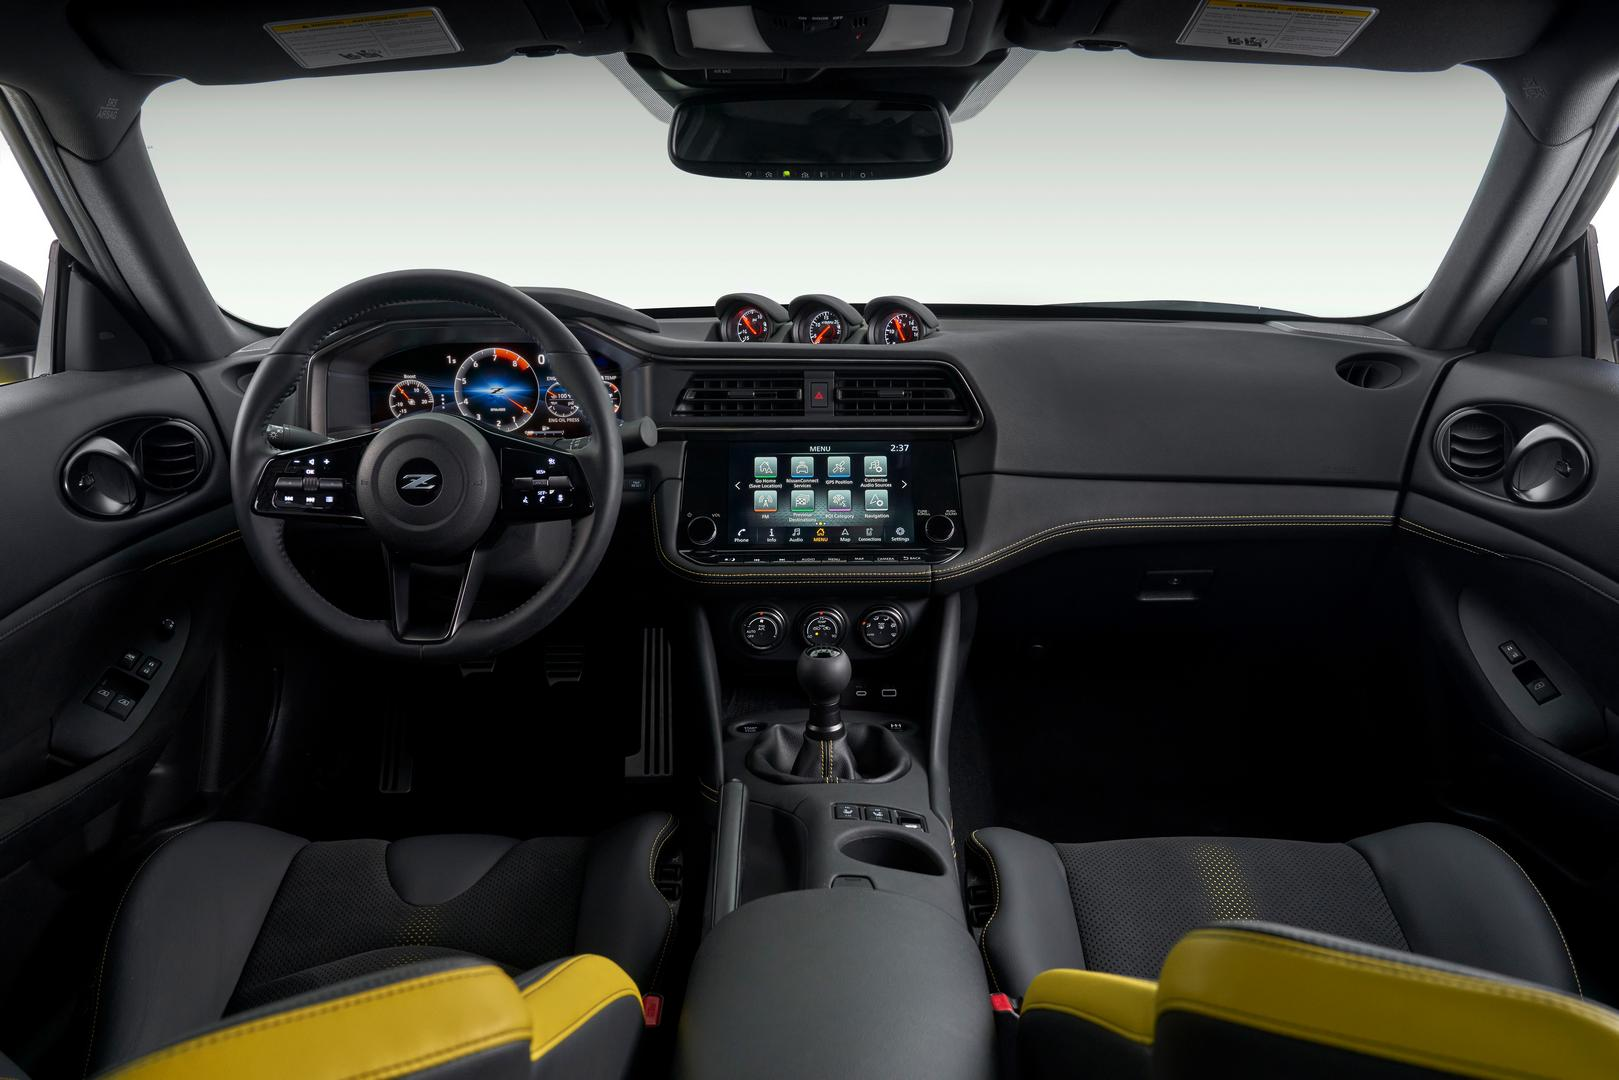 2022 Nissan Z Proto Spec interior